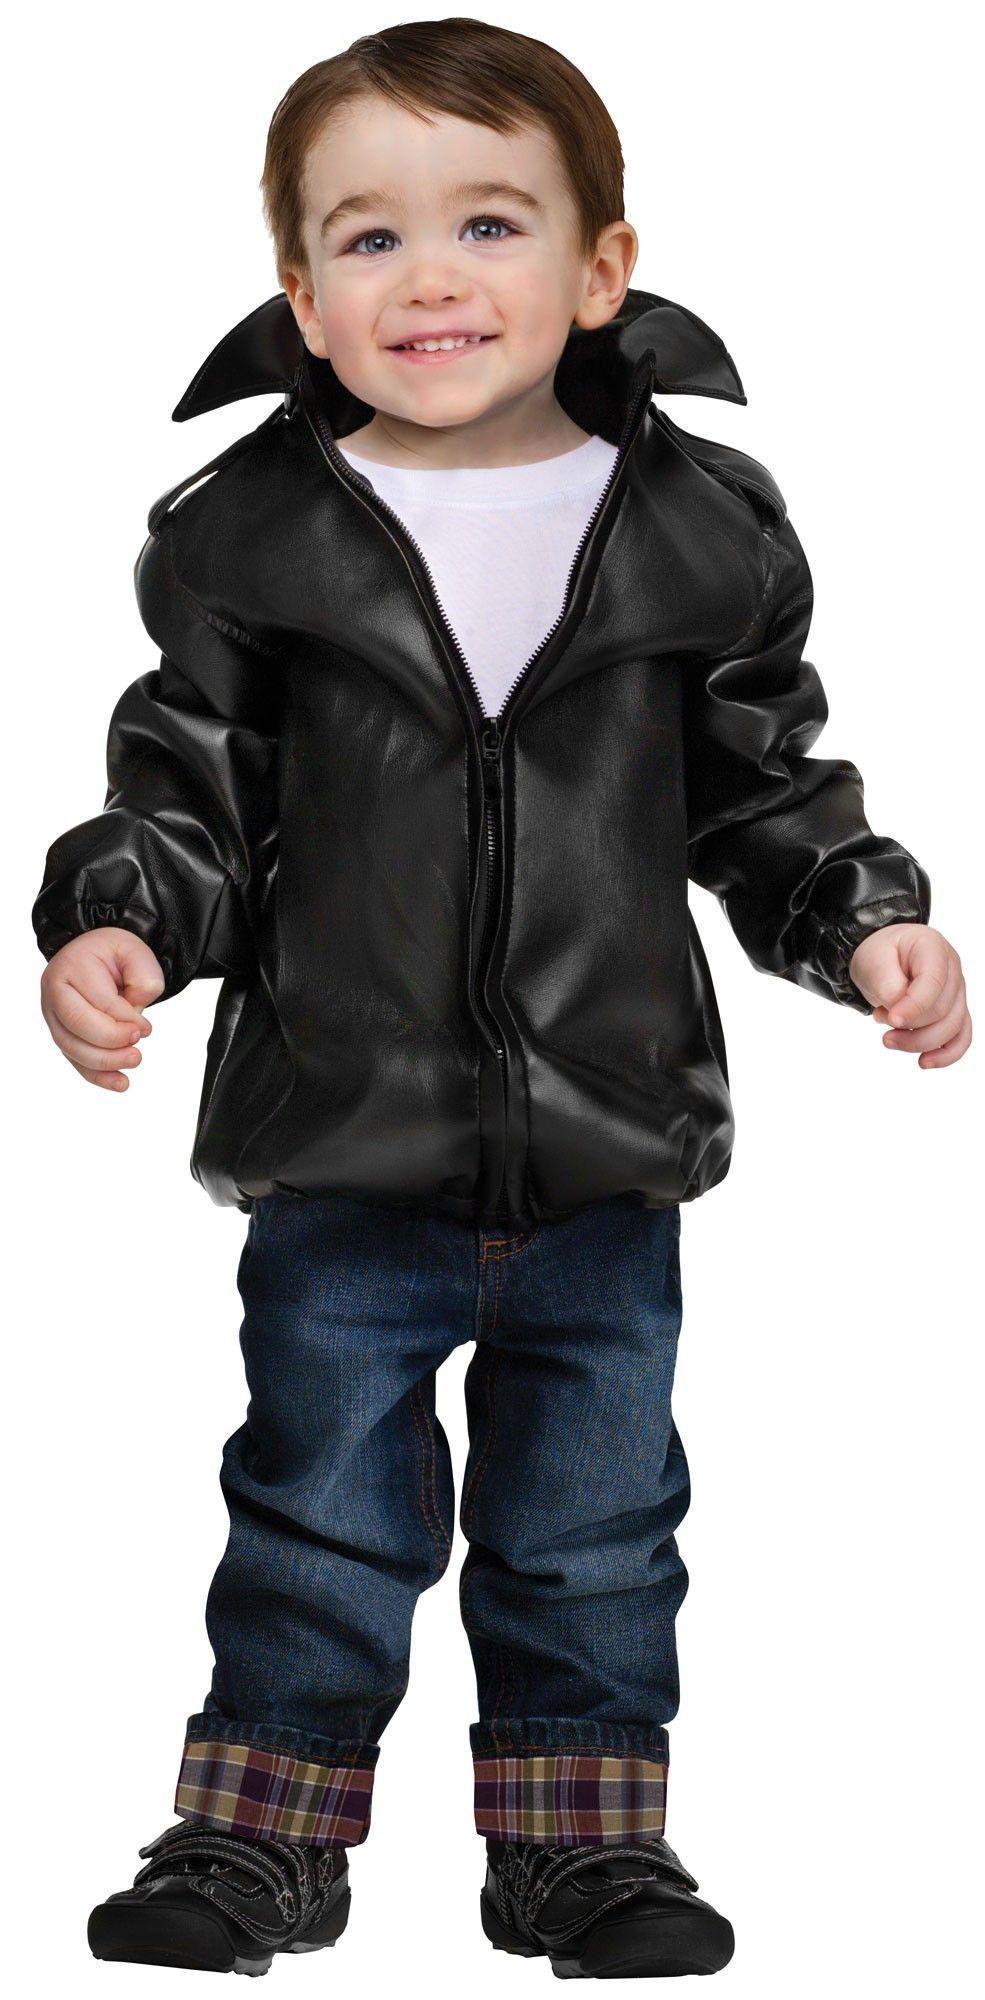 fdb7e15ff T-Bird Jacket Toddler Costume